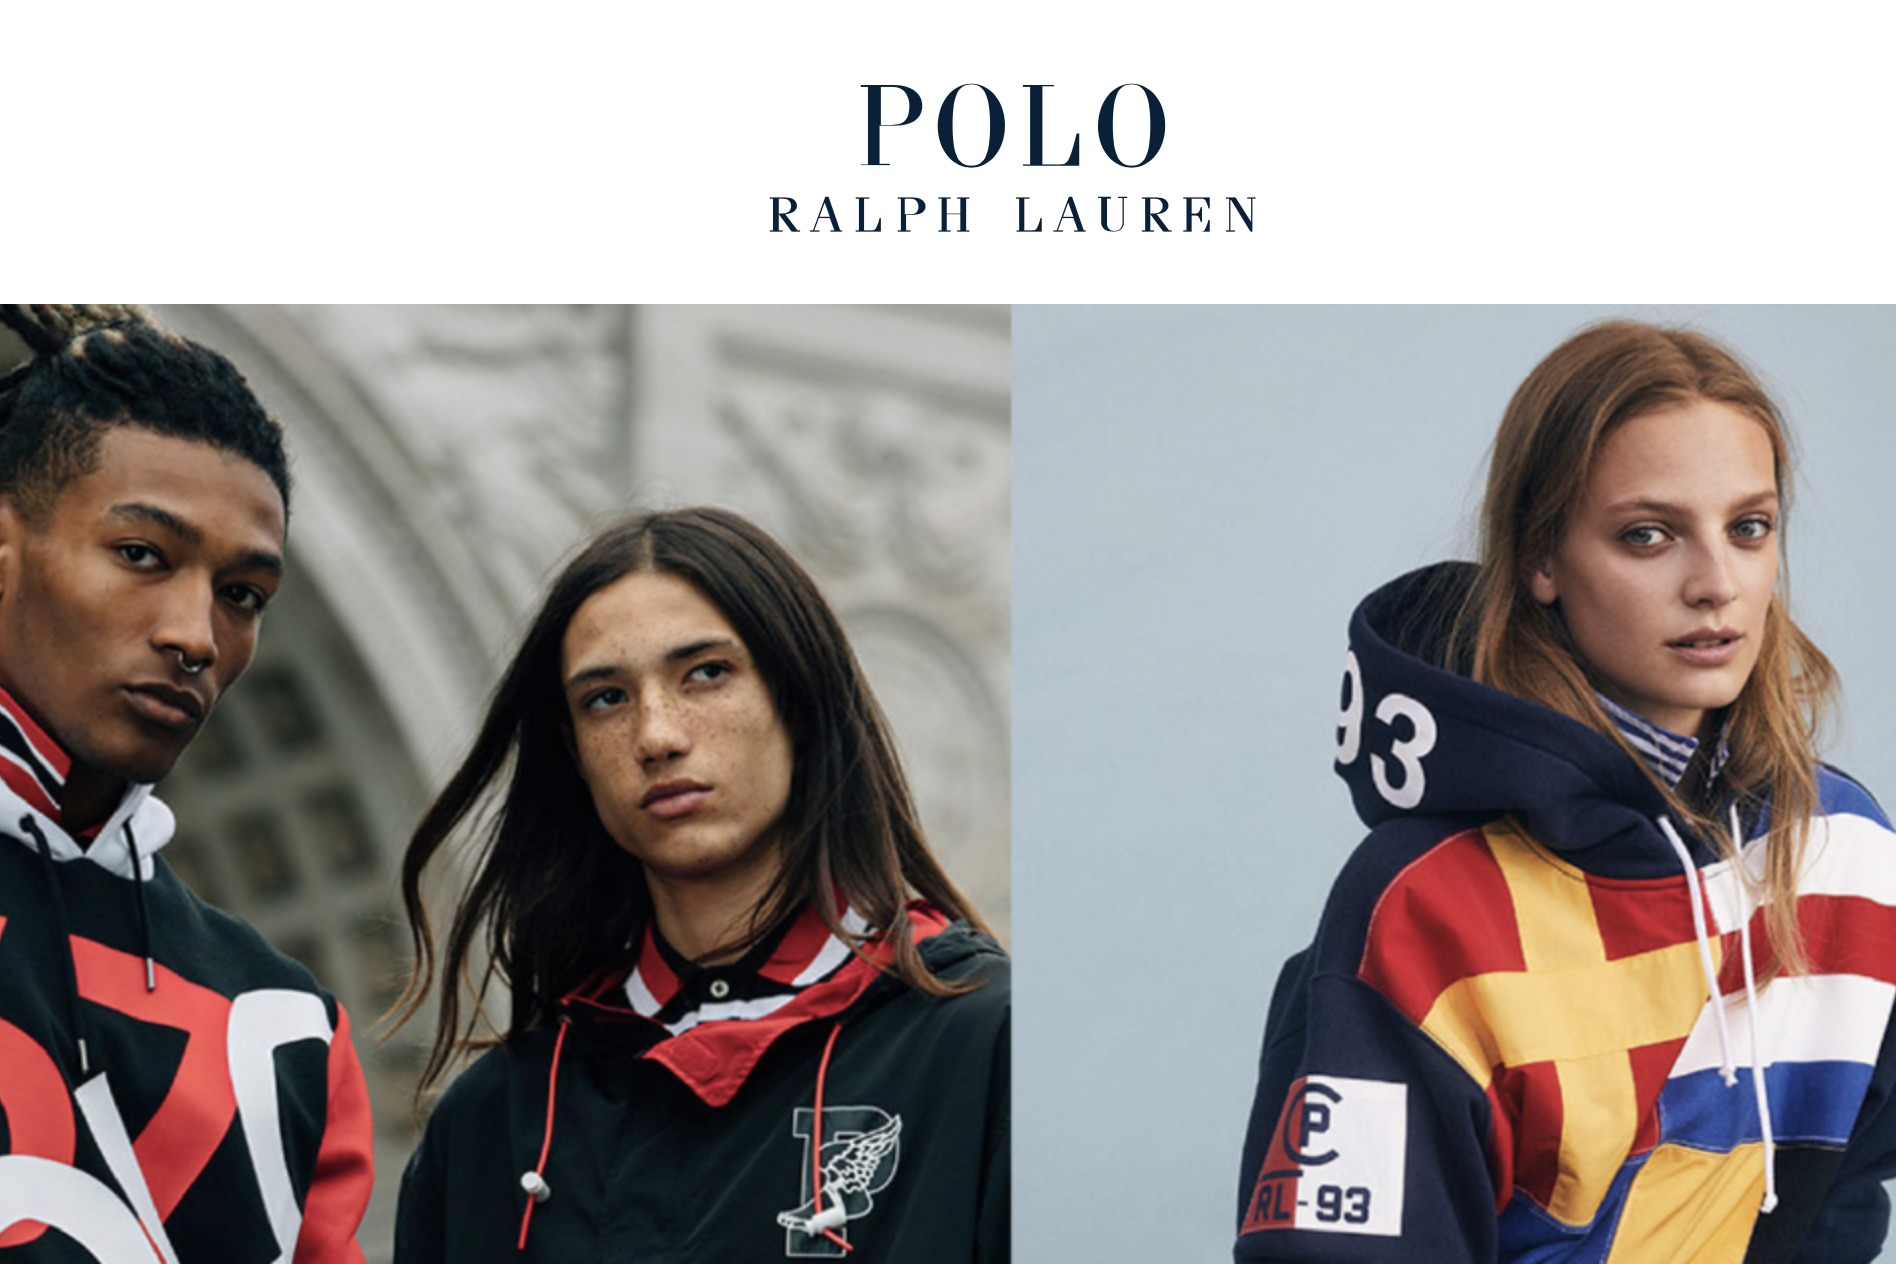 Ralph Lauren 推出数字产品 ID技术,将首先应用于旗下 Polo 整个产品线